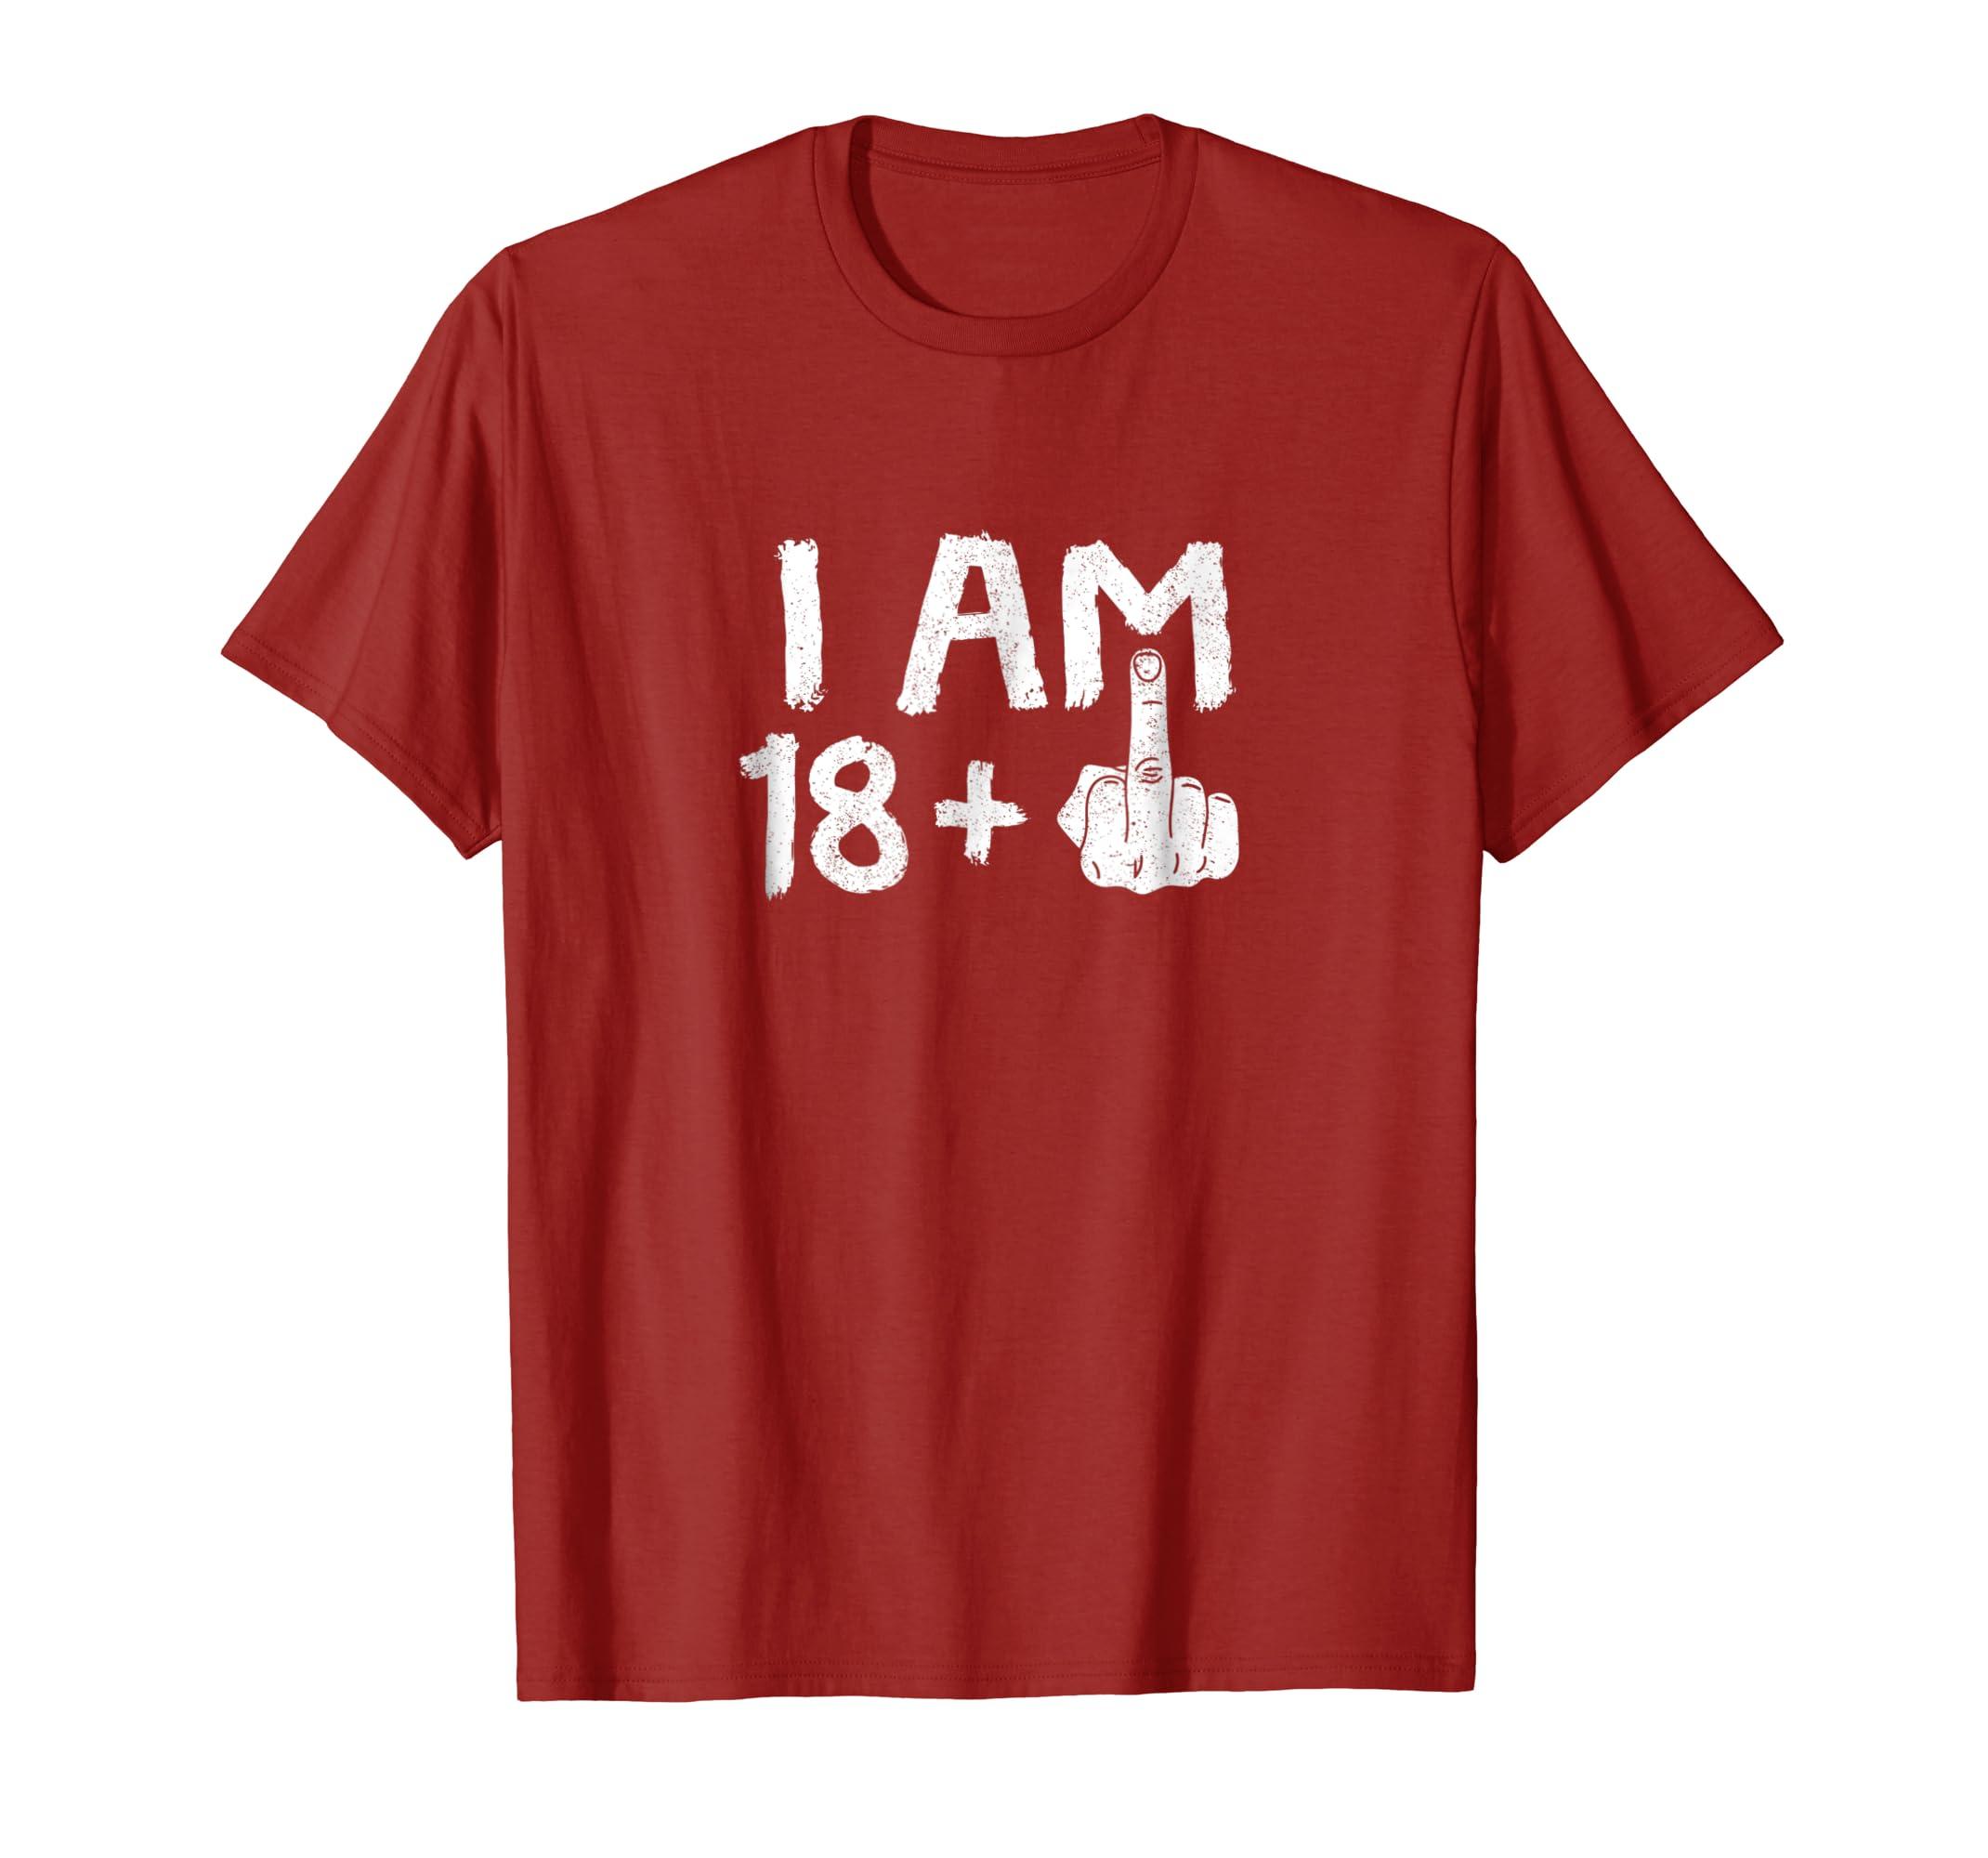 Amazon 19 Years Old T Shirt Fun 19th Birthday Gift Ideas Christmas Clothing